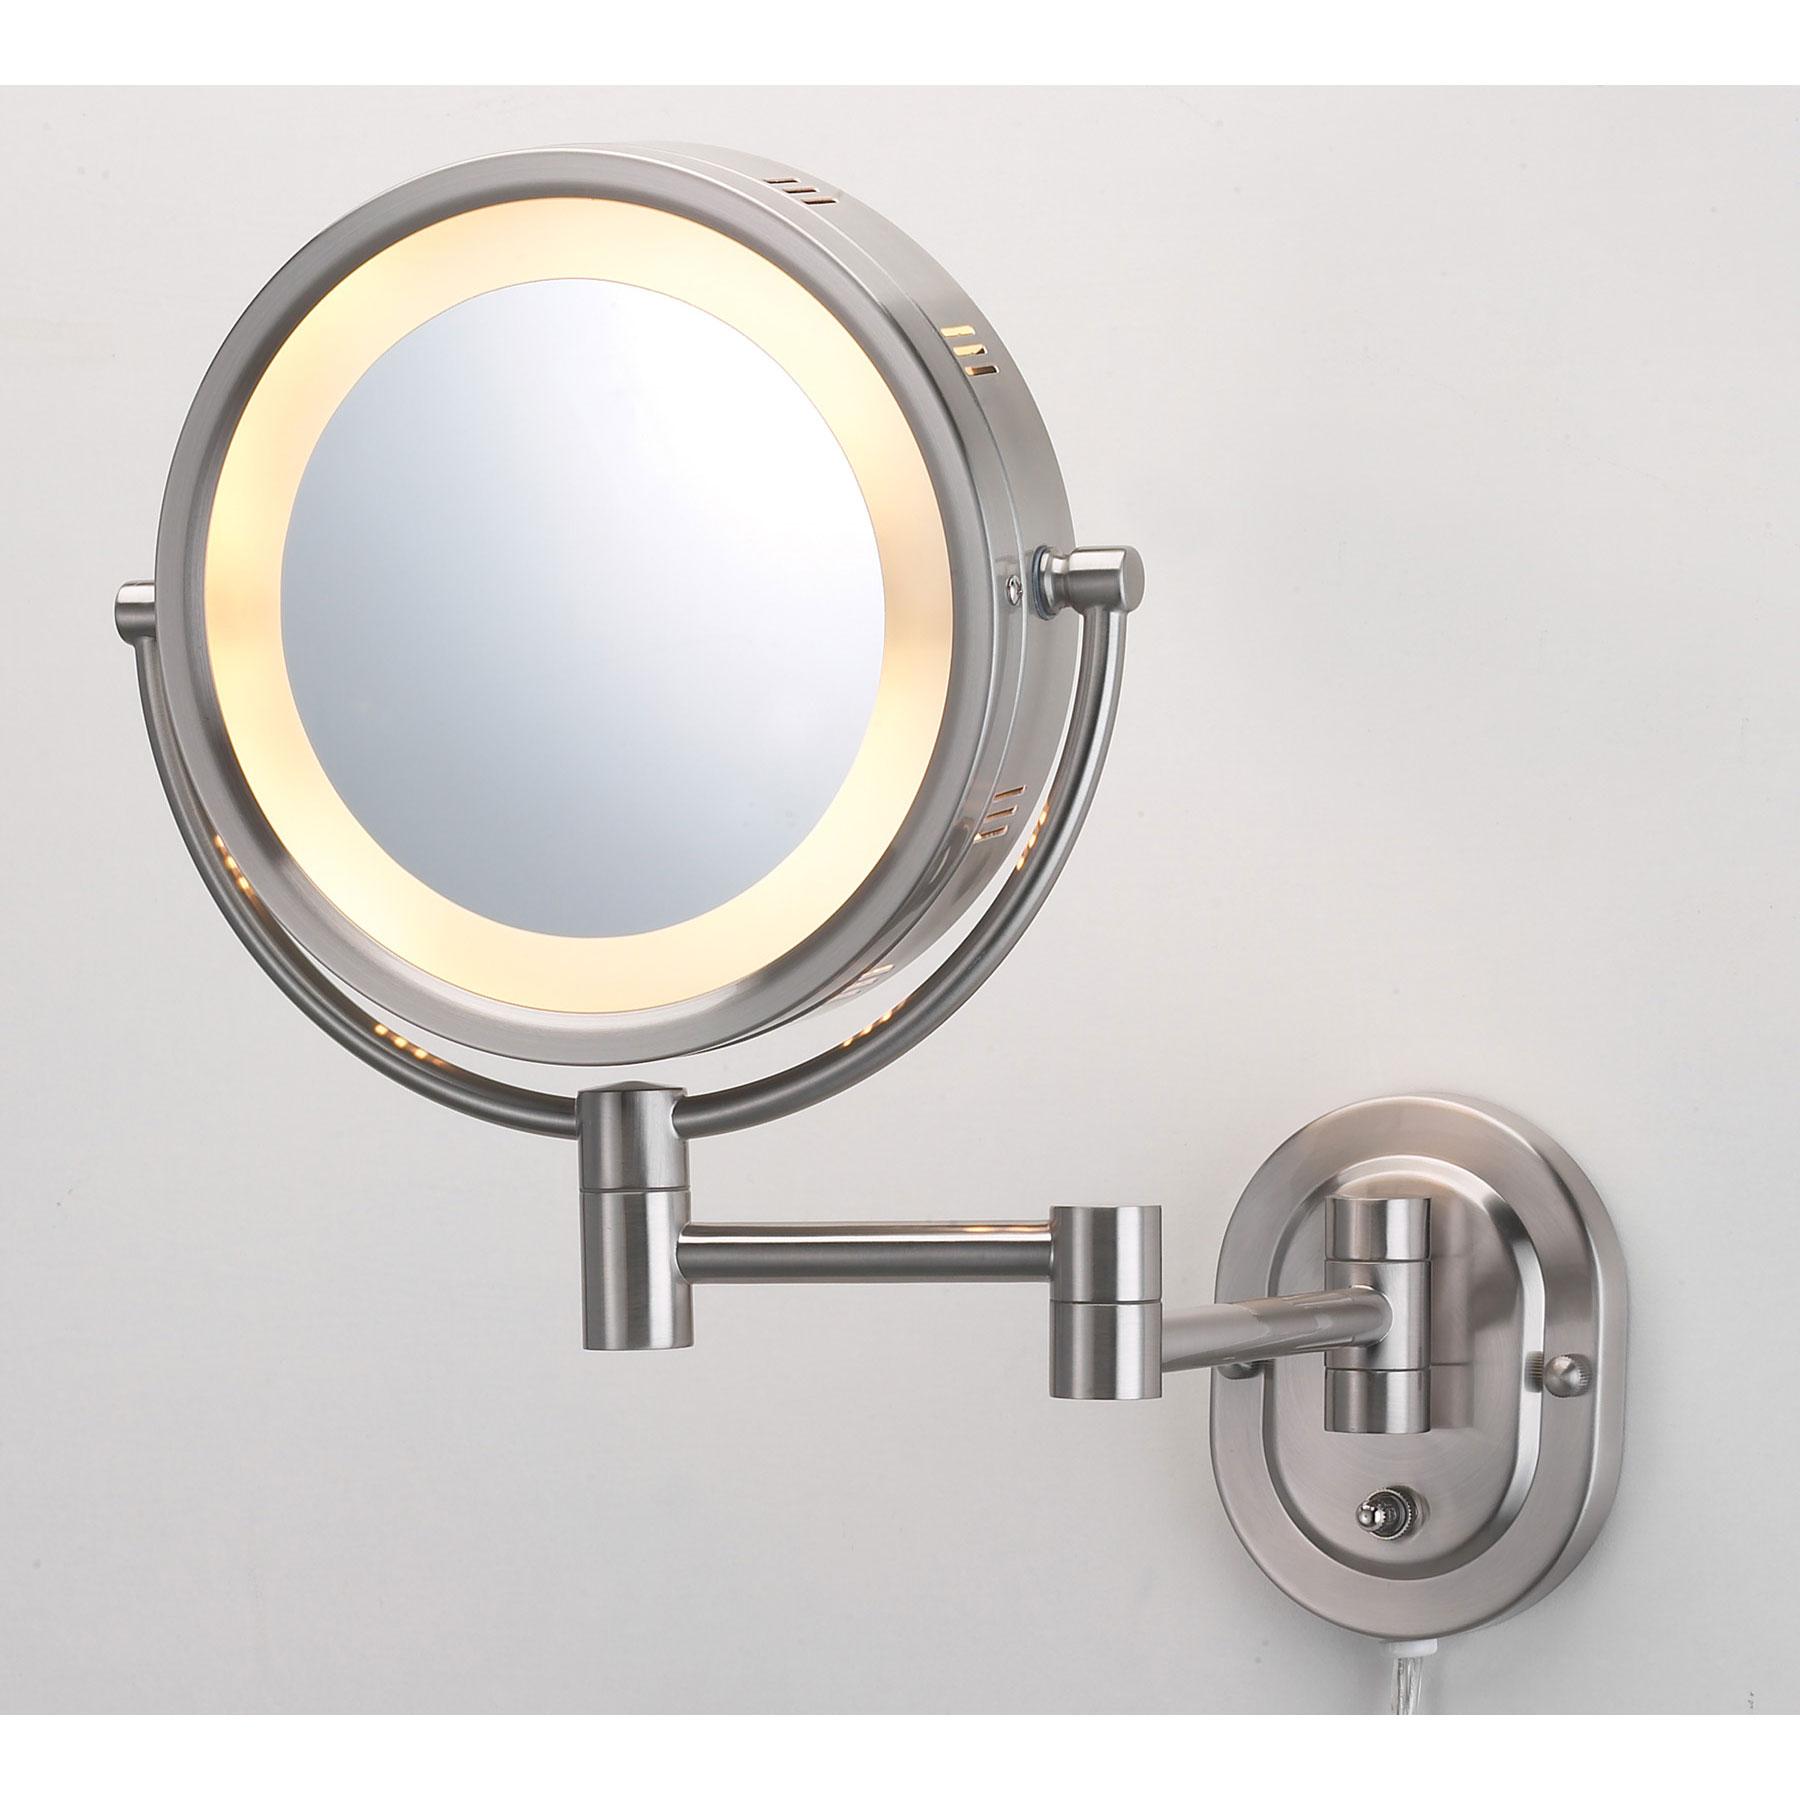 rearview mirror wiring diagram 2005 chevy silverado jerdon hl65nd 8